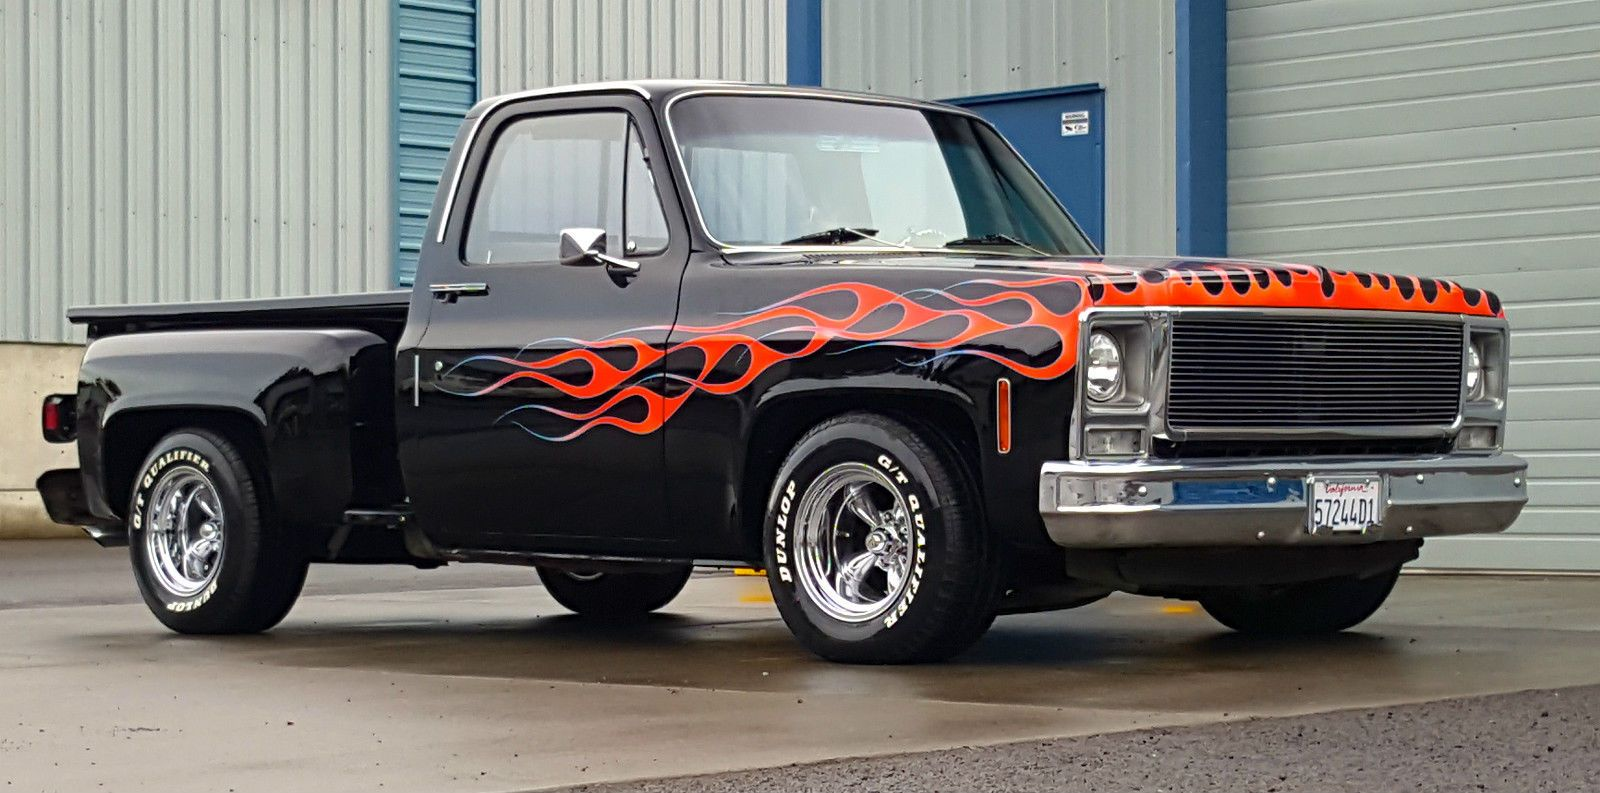 1979 chevrolet c 10 scottsdale step side pickup custom custom trucks for sale pinterest. Black Bedroom Furniture Sets. Home Design Ideas